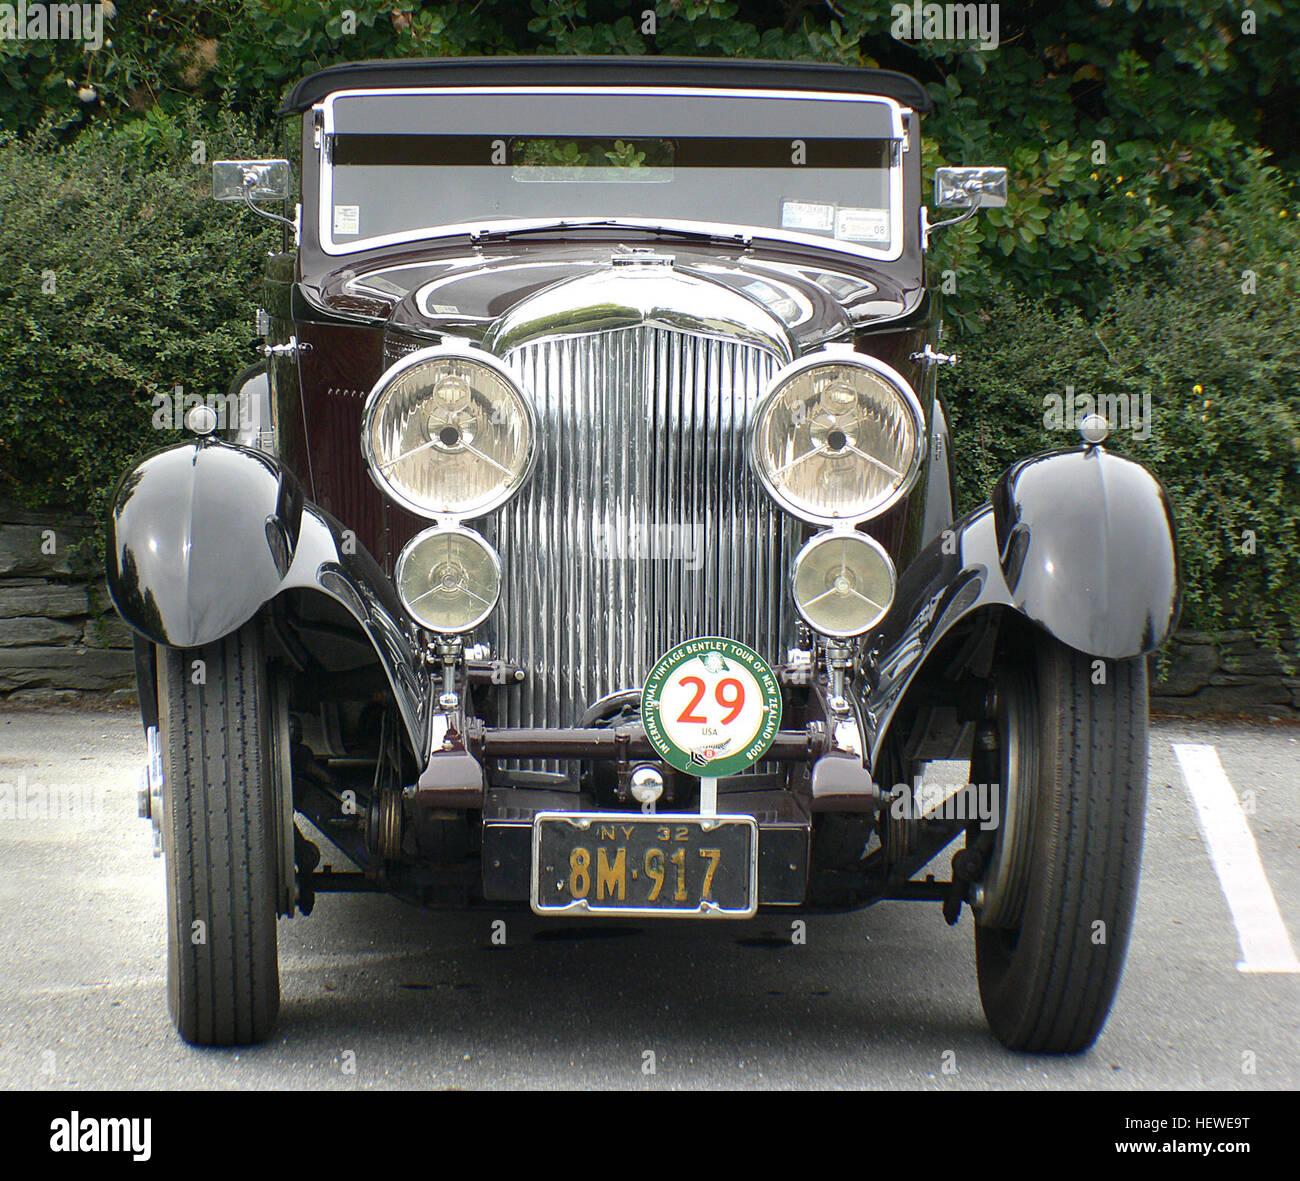 Ication Bentley Speed Bridge CameraBritish Classic - Sports cars international